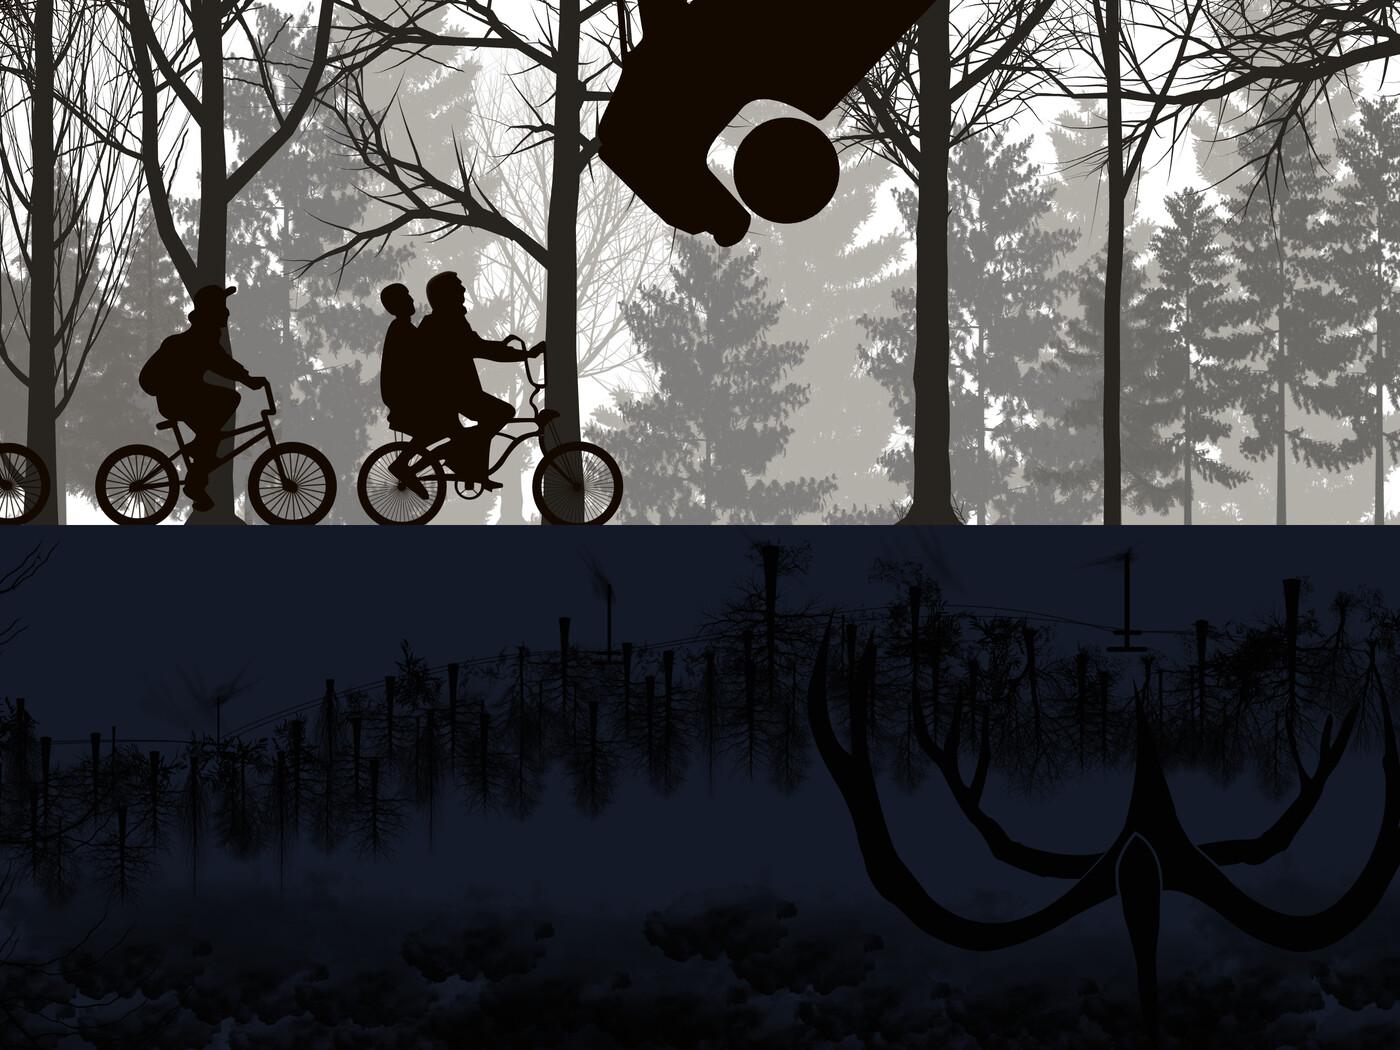 stranger-things-season-2-upside-down-artwork-mg.jpg